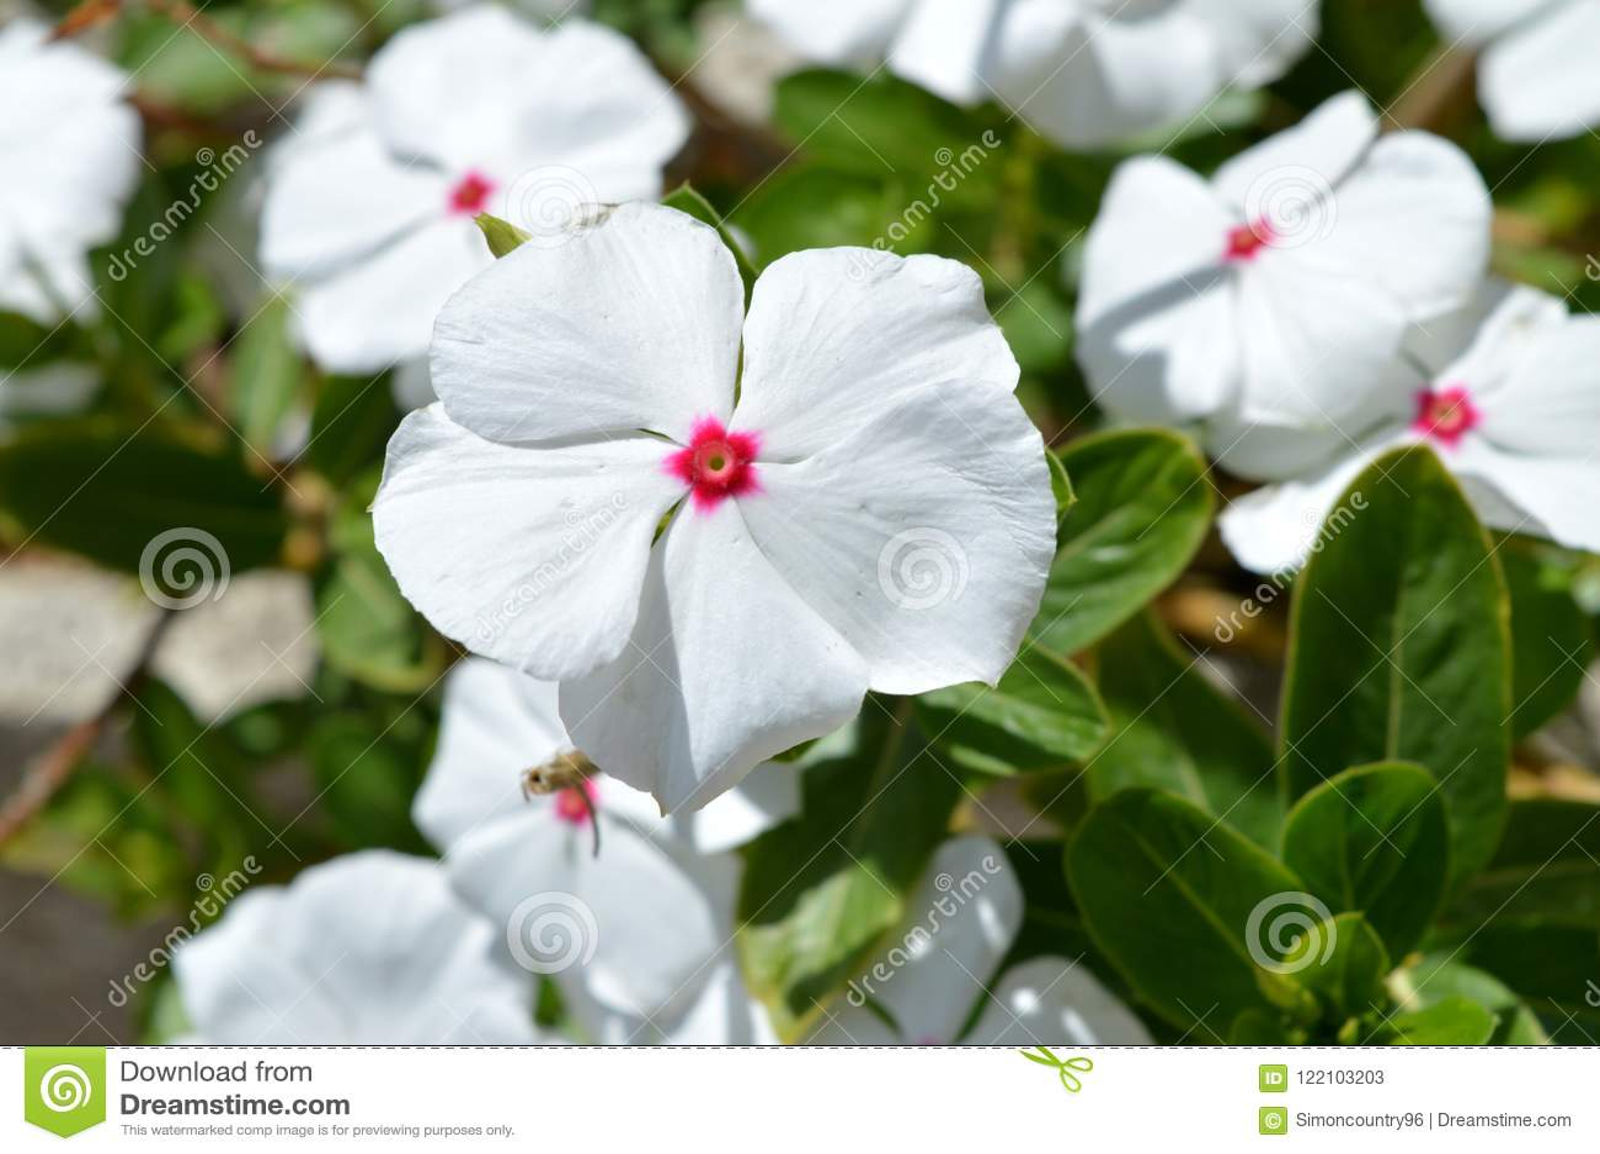 Close-up Of White Madagascar Periwinkle Flowers ...